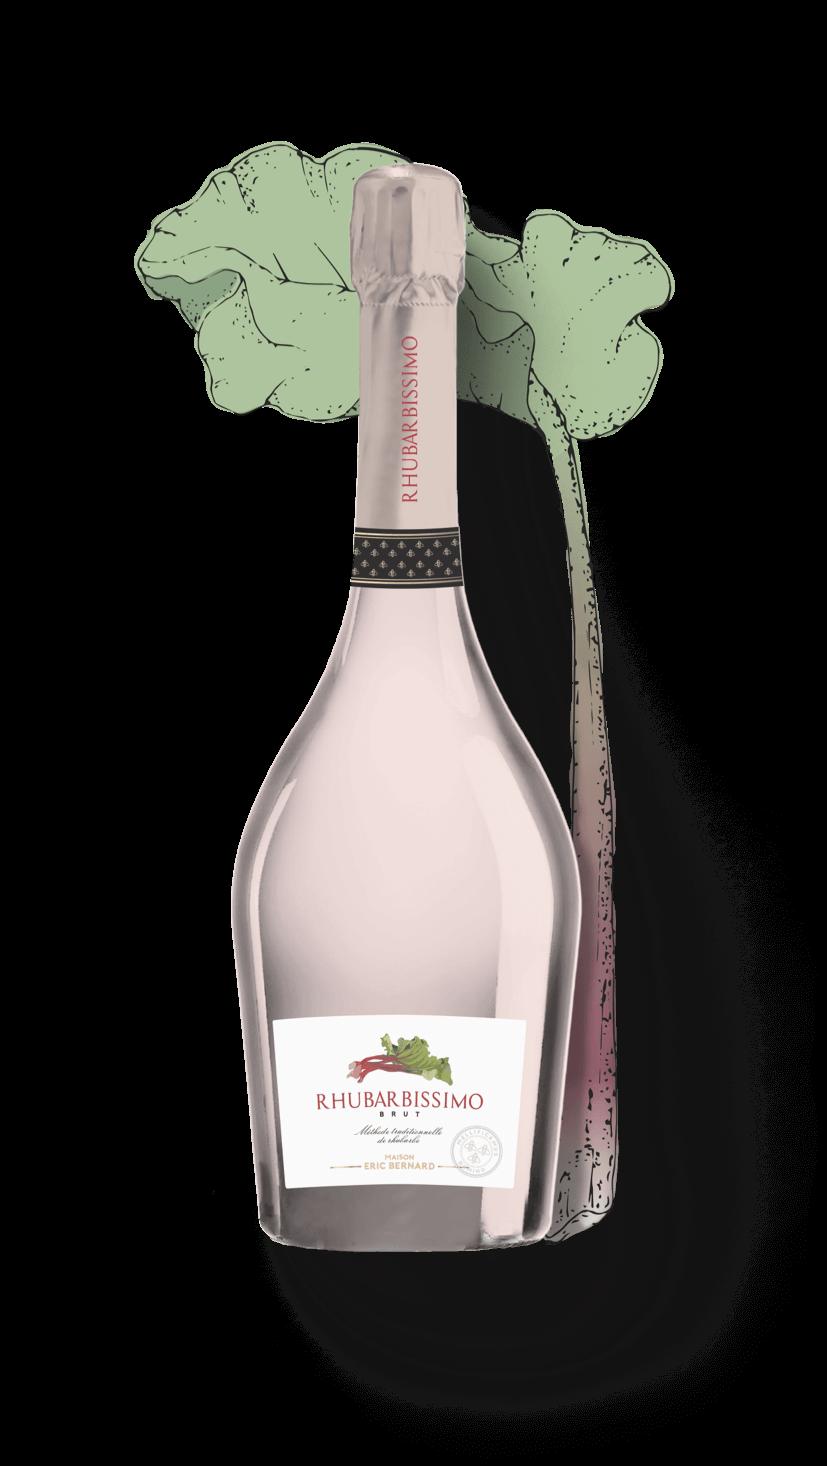 Bouteille de vin effervescent de rhubarbe brut